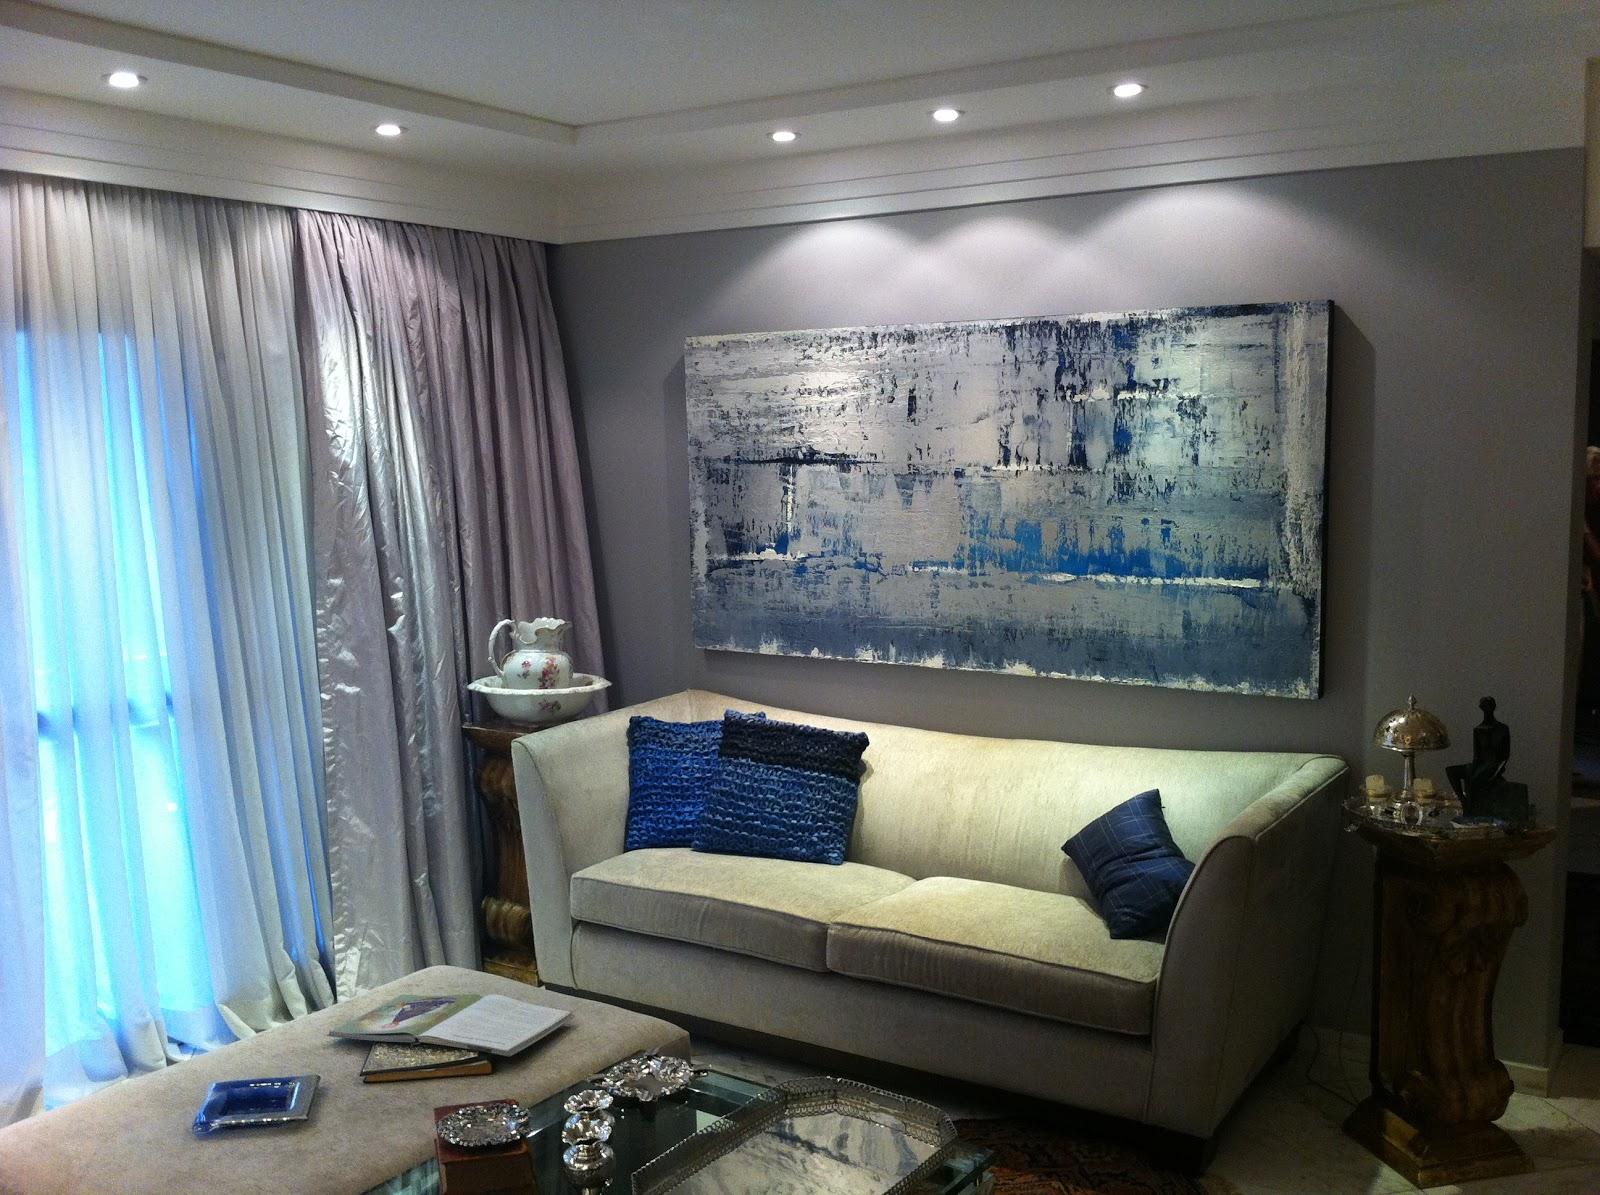 Fotos De Telas Para Sala De Jantar ~ Fabio Daher Tela Glaciar adquirida para sala de estar